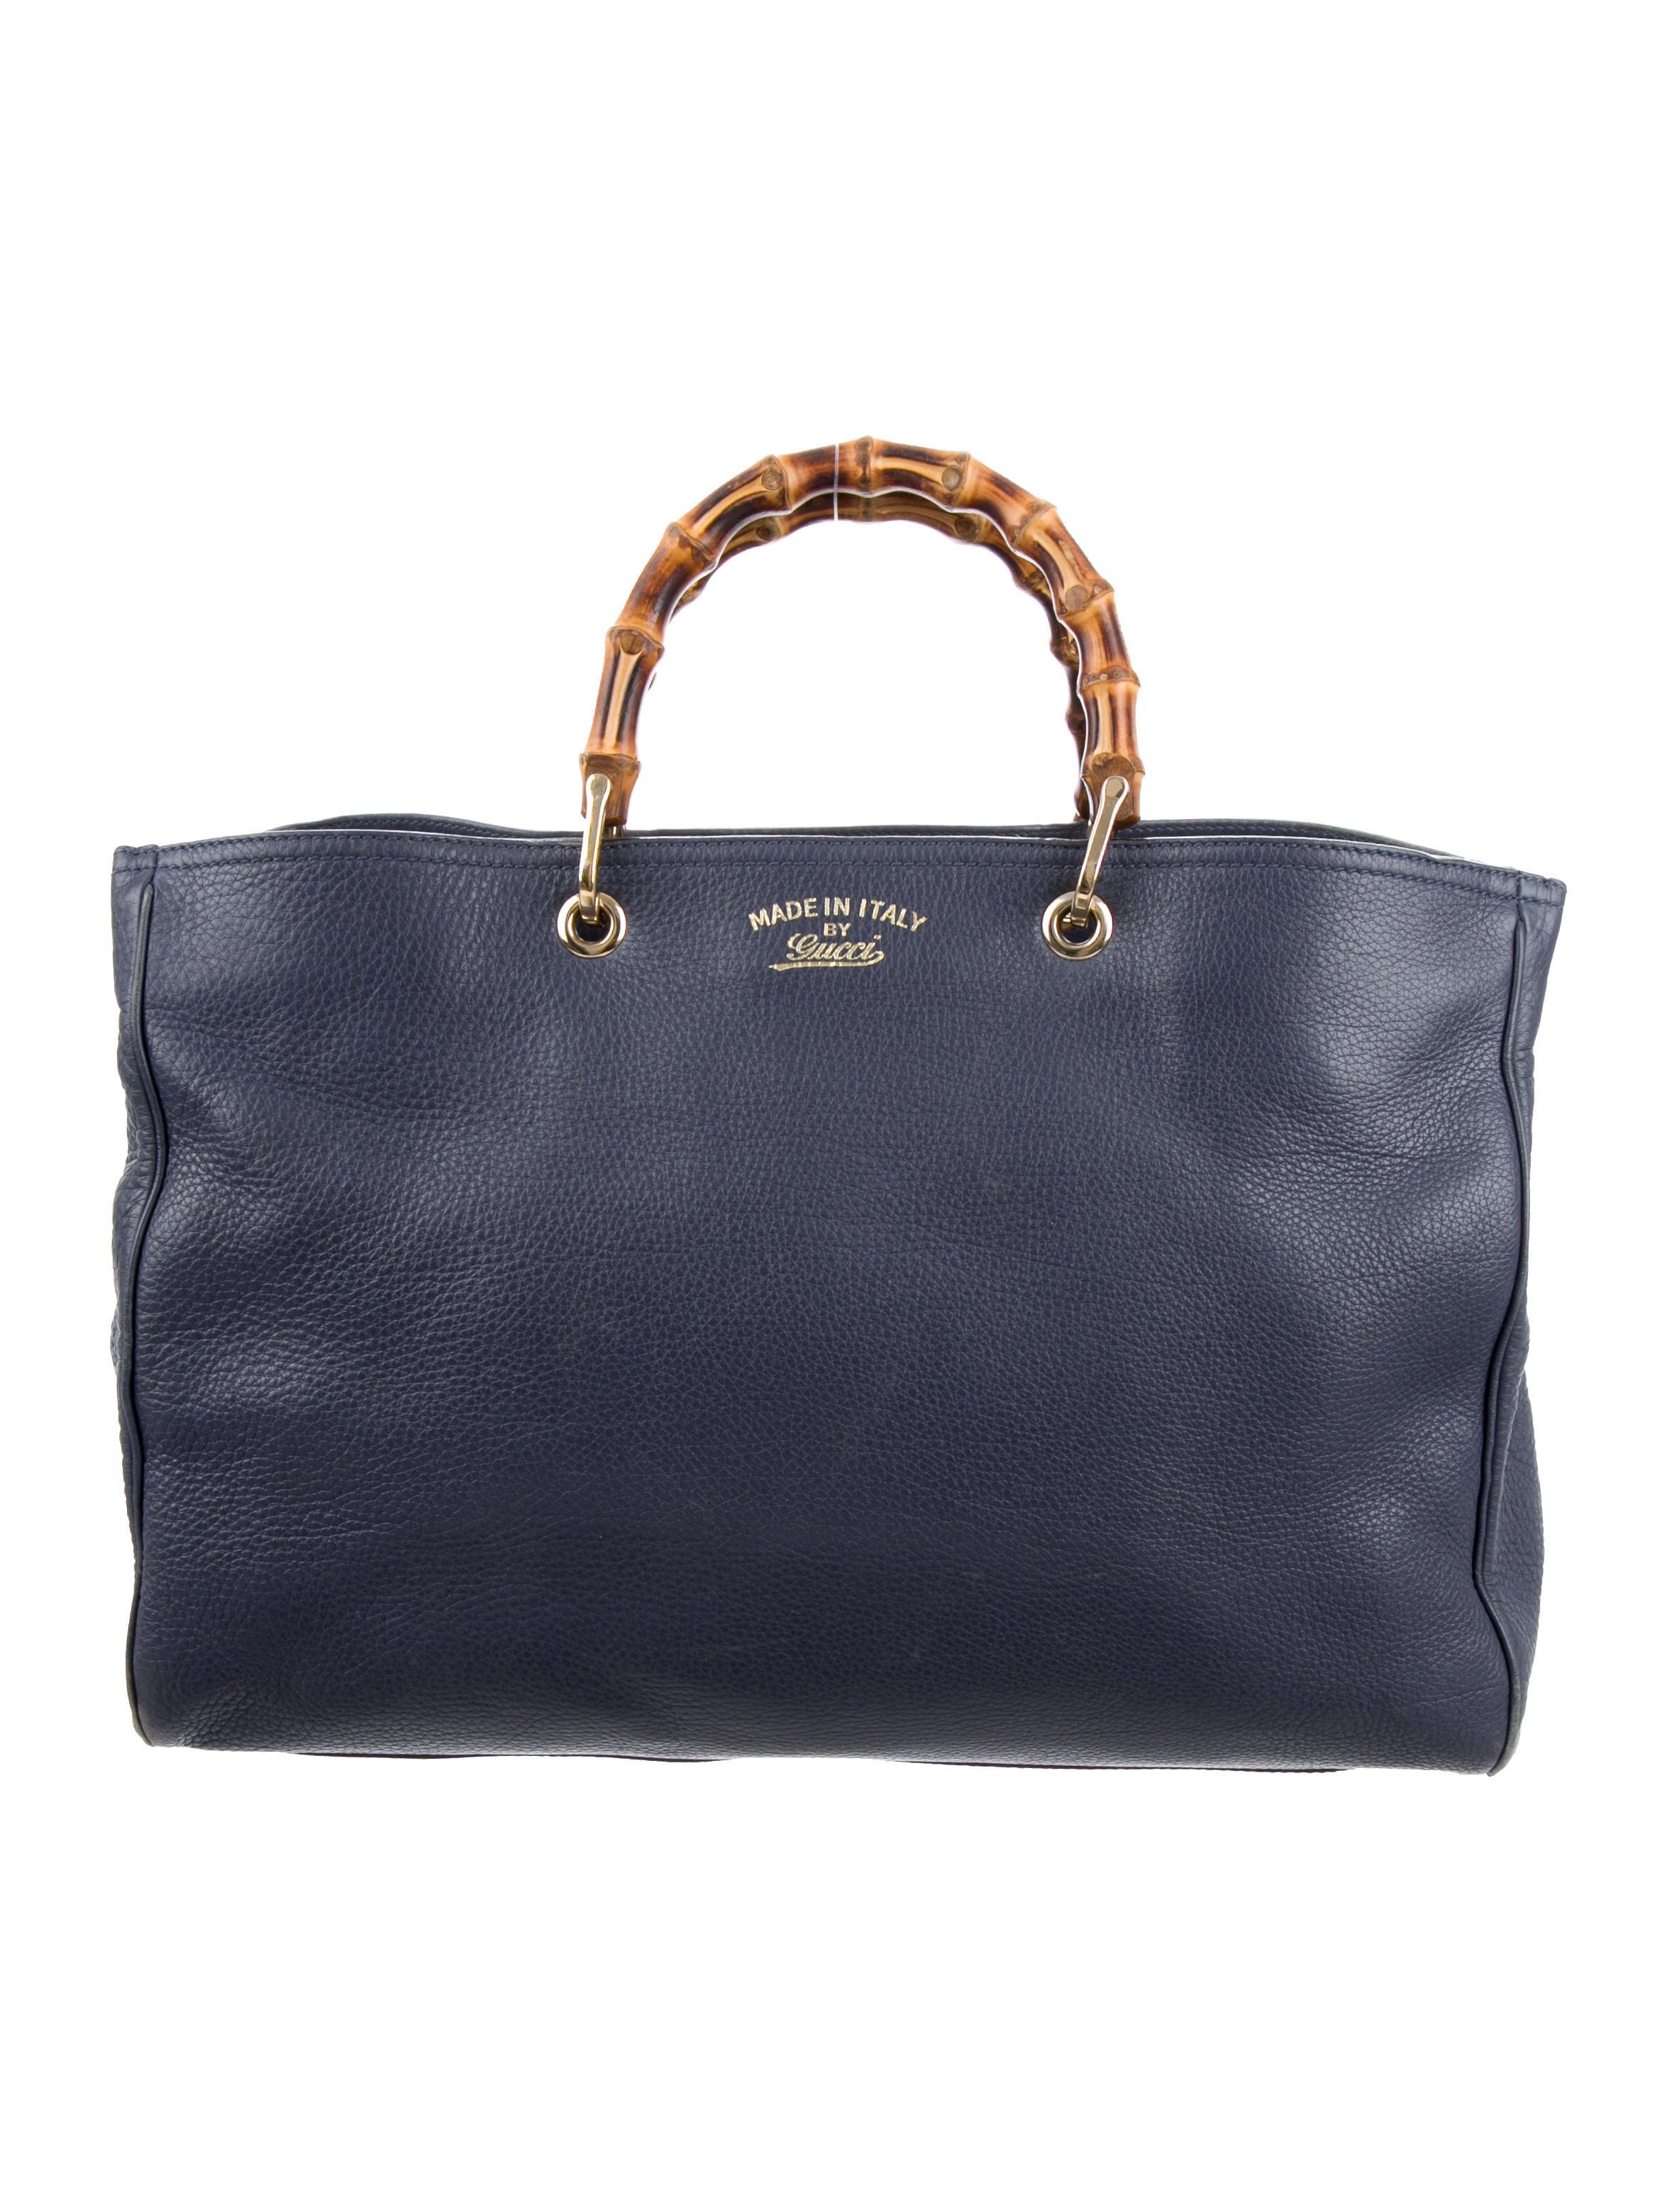 gucci large bamboo shopper tote handbags guc126953 the realreal. Black Bedroom Furniture Sets. Home Design Ideas